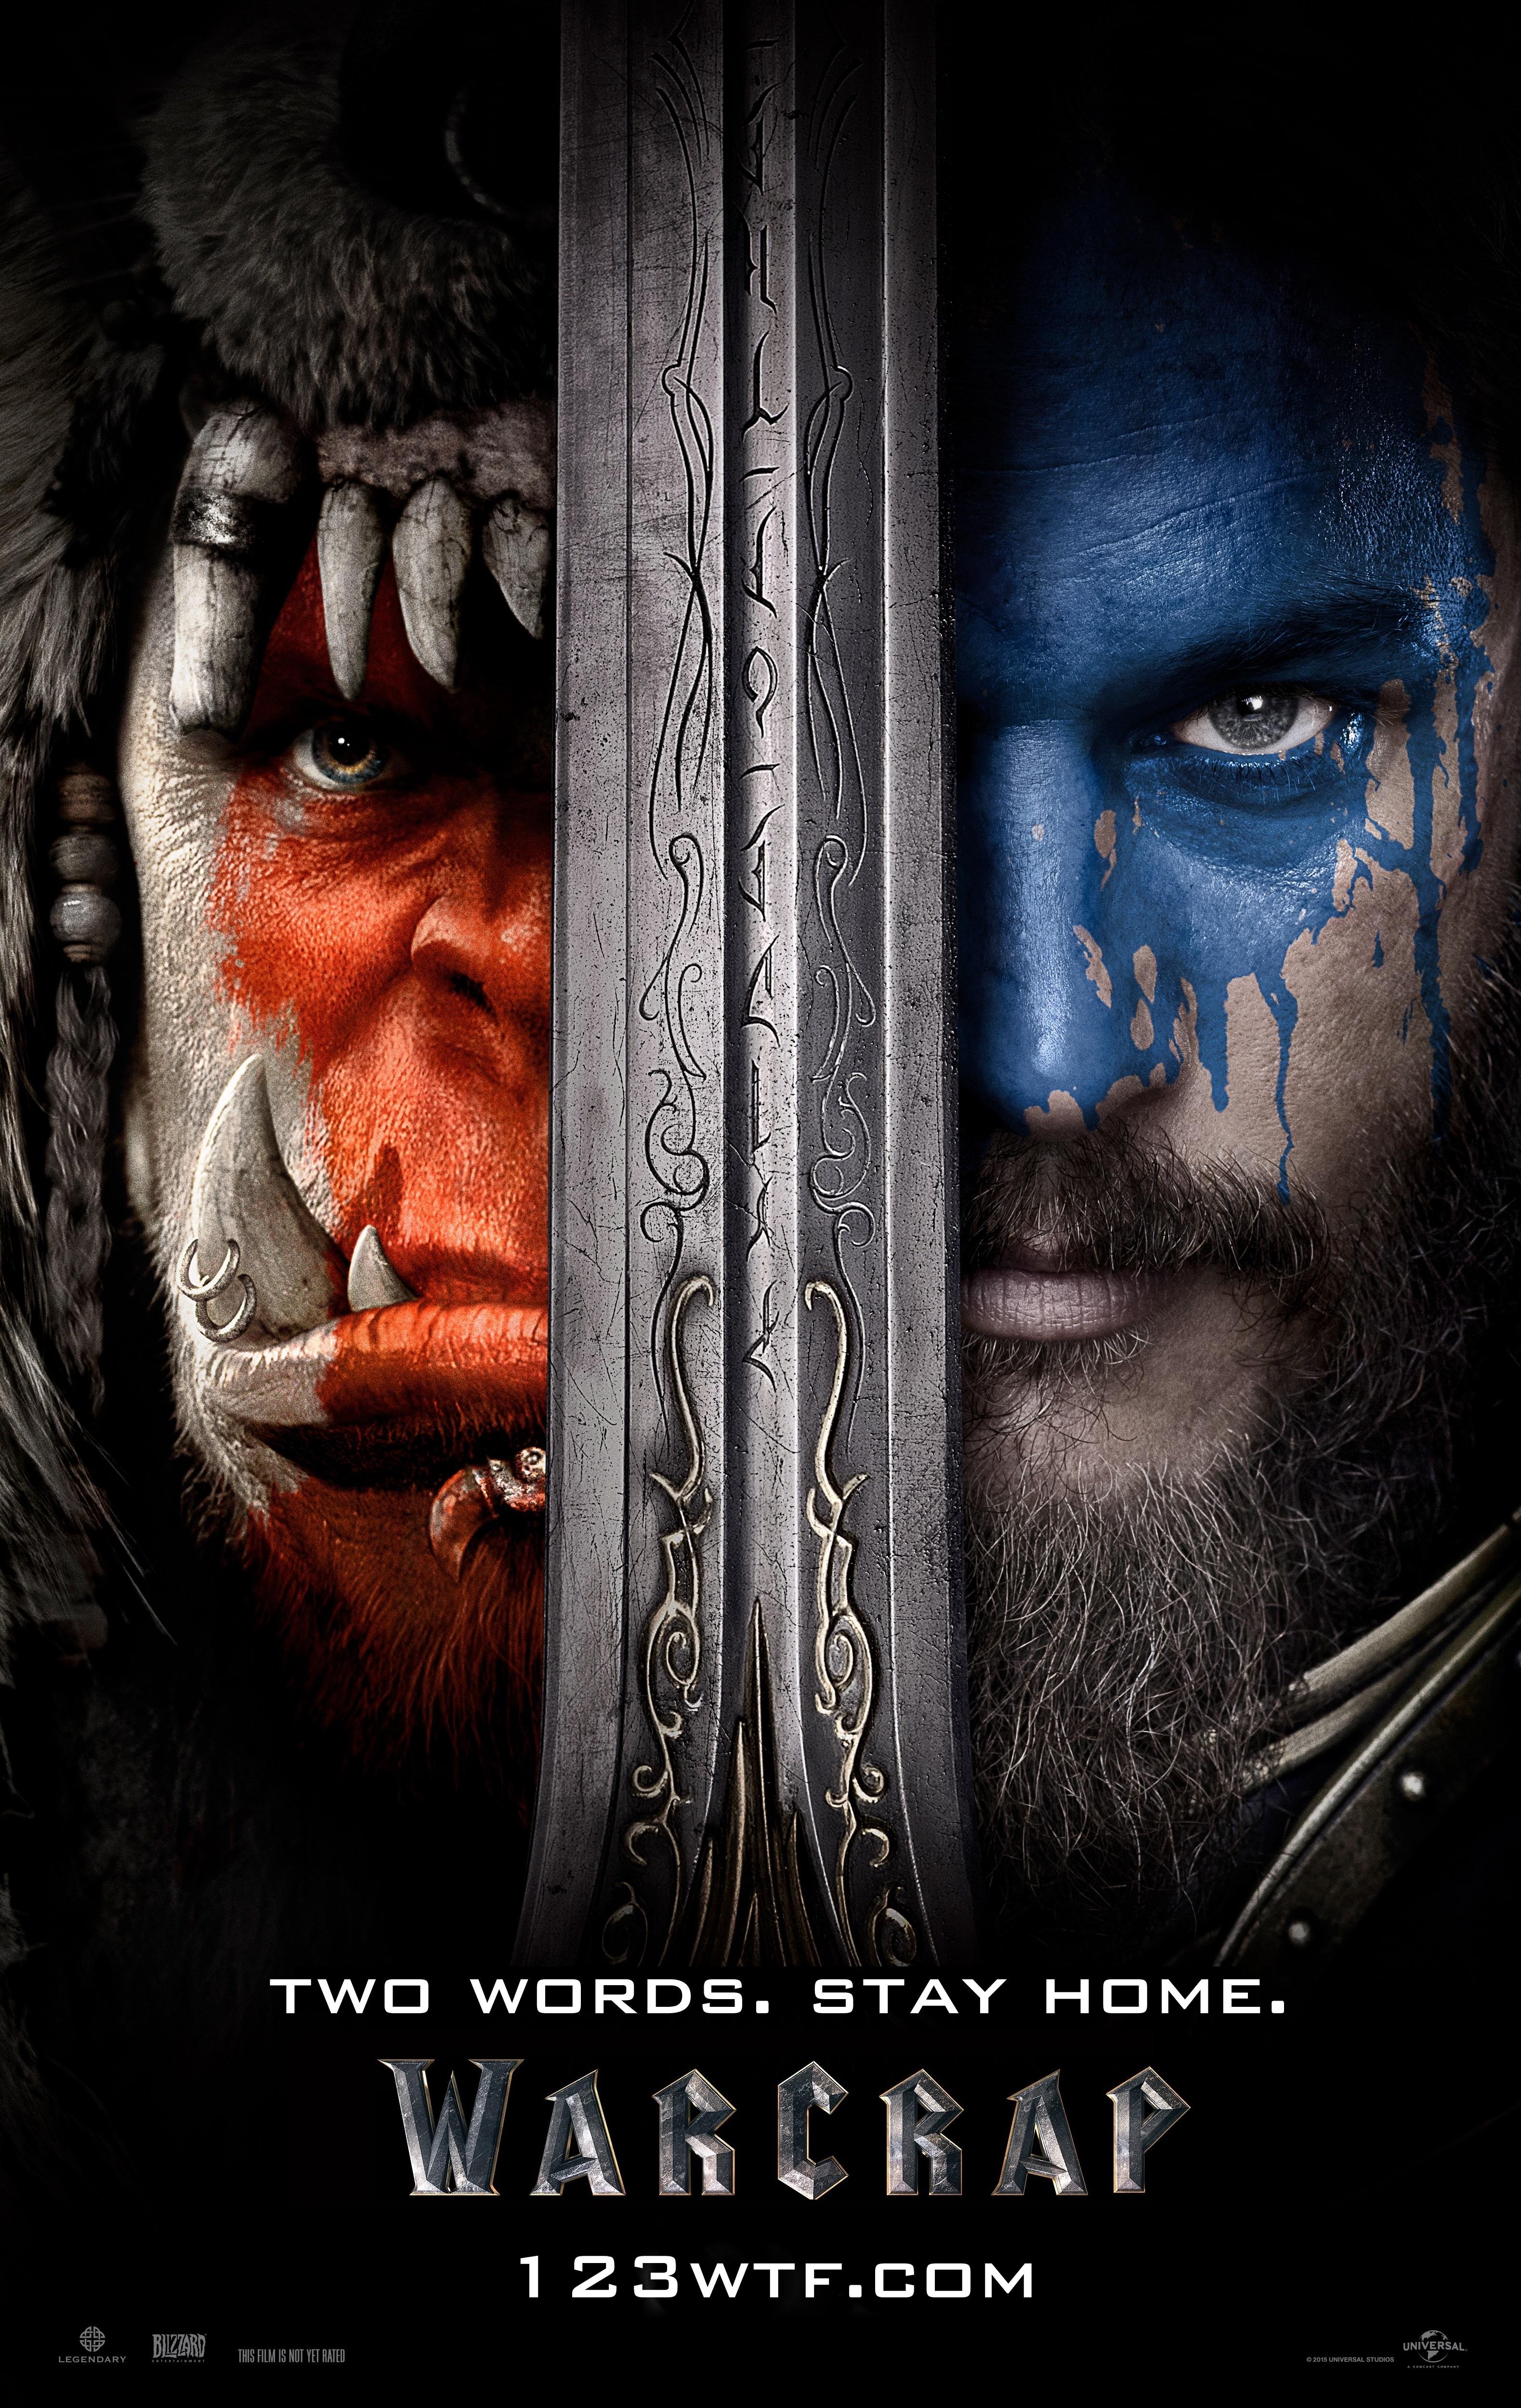 Warcraft Memes 1 2 3 Wtf Watch The Film